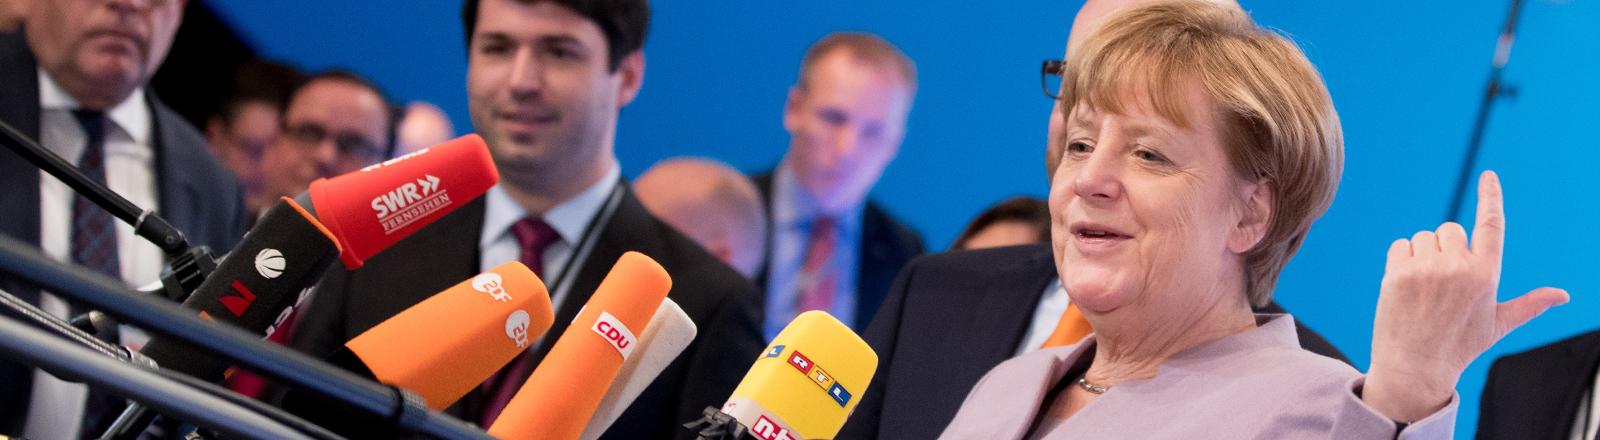 Bundeskanzlerin Angela Merkel am 05.12.2016 in Essen.